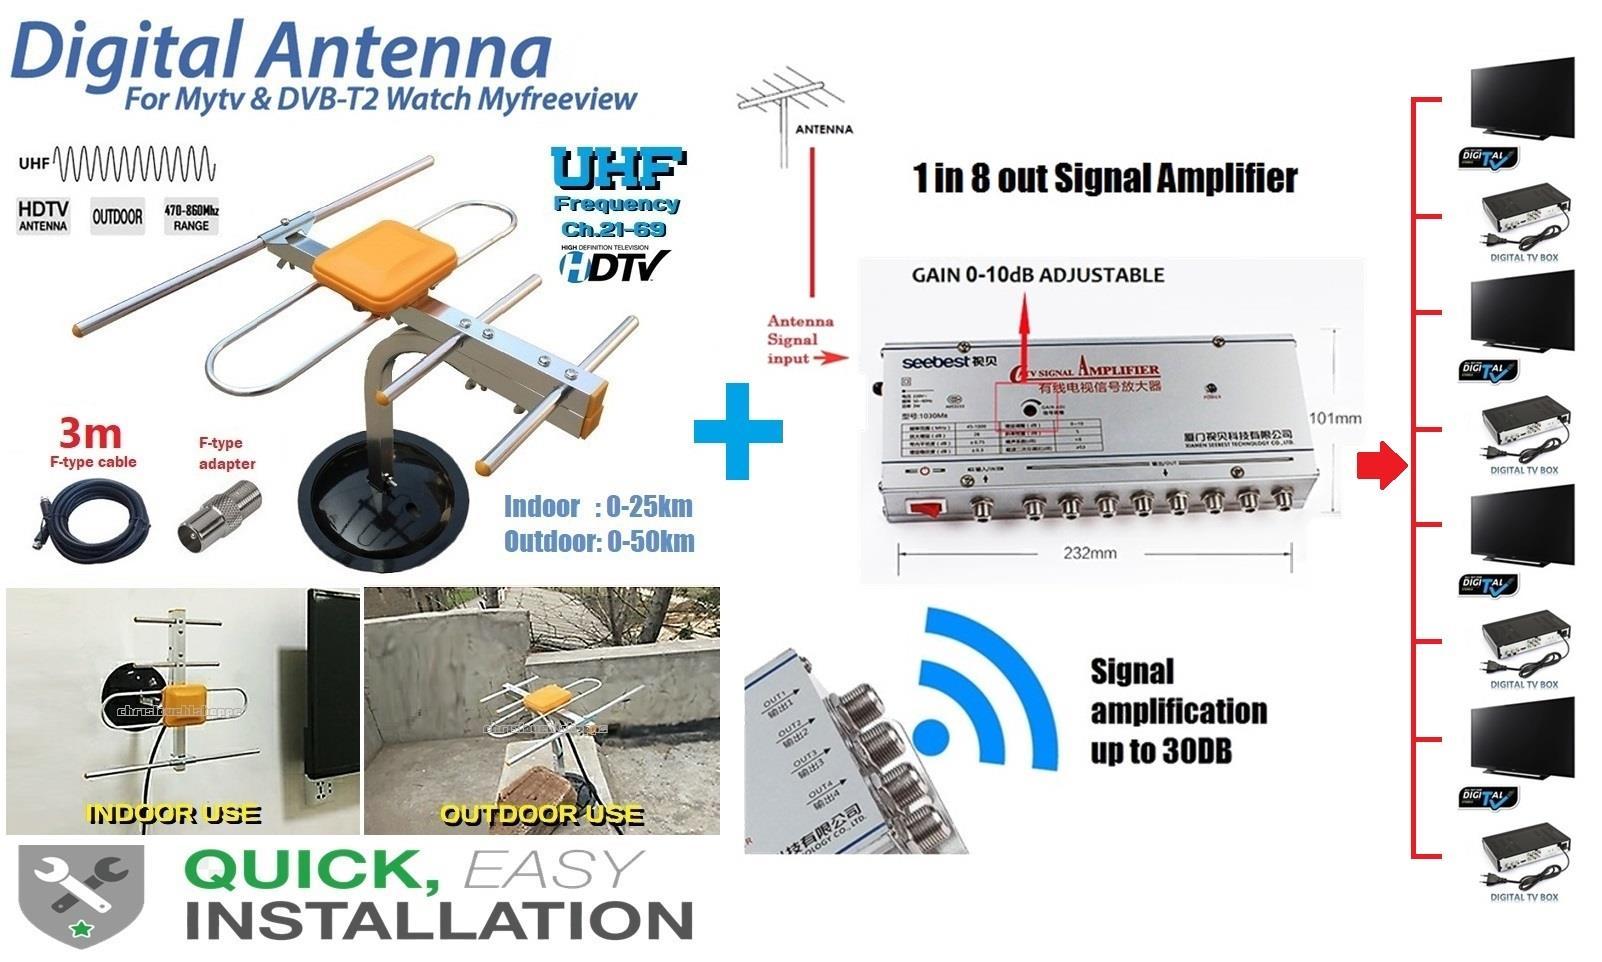 8 WAY HDTV CATV DIGITAL TV Antenna SignalLine Booster Splitter 1in8out